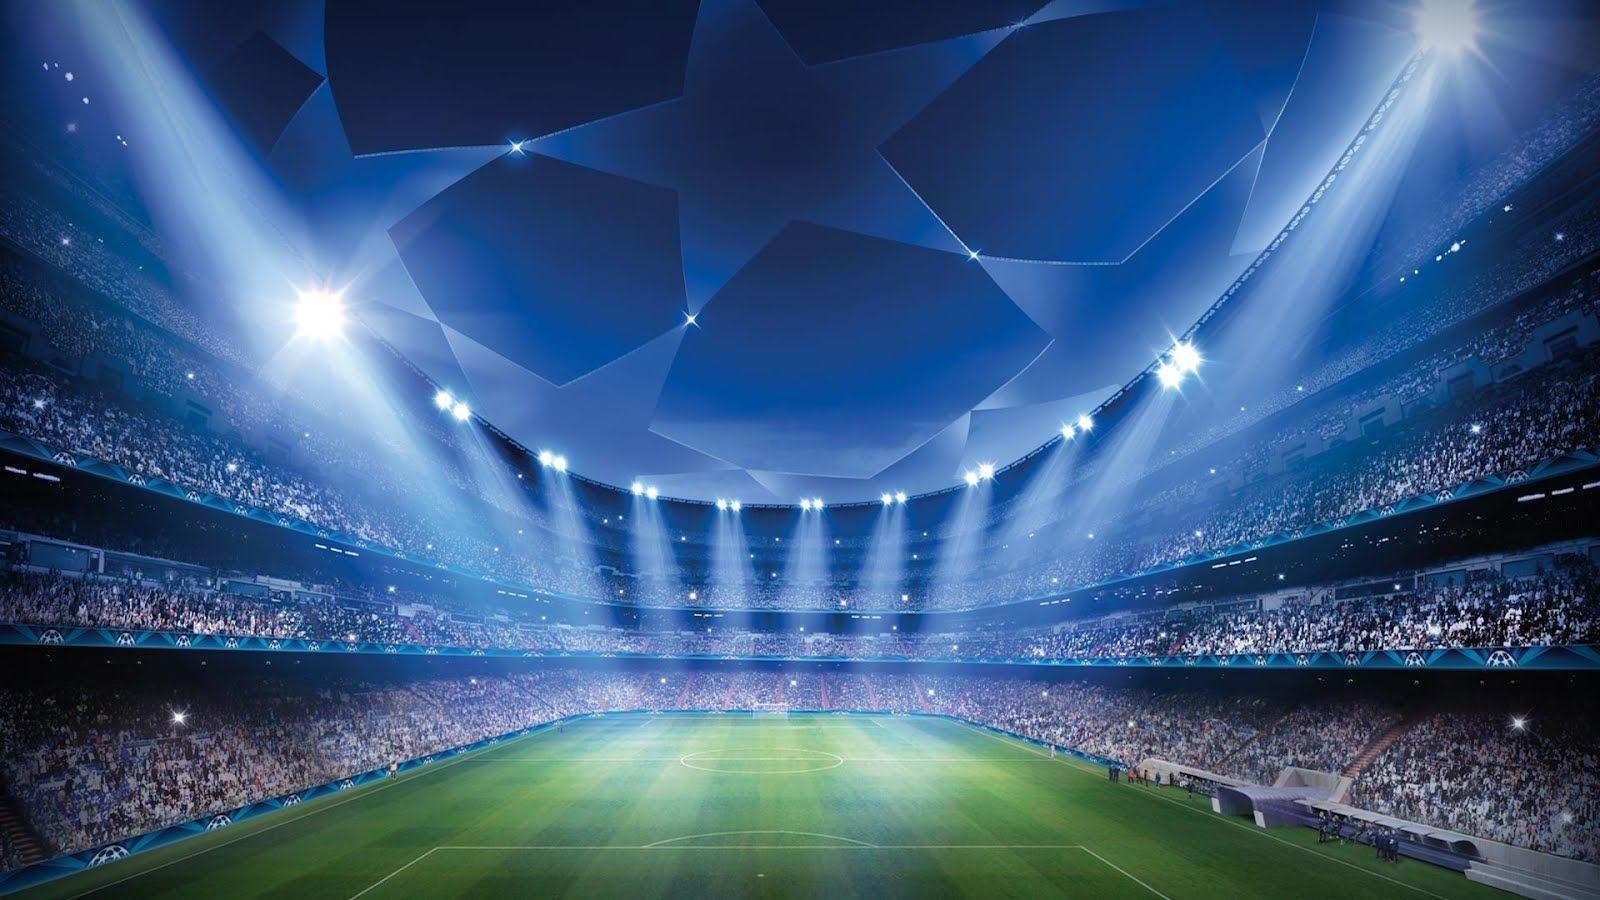 champions league wallpaper 9e0   hd wallpaper, blue wallpaper